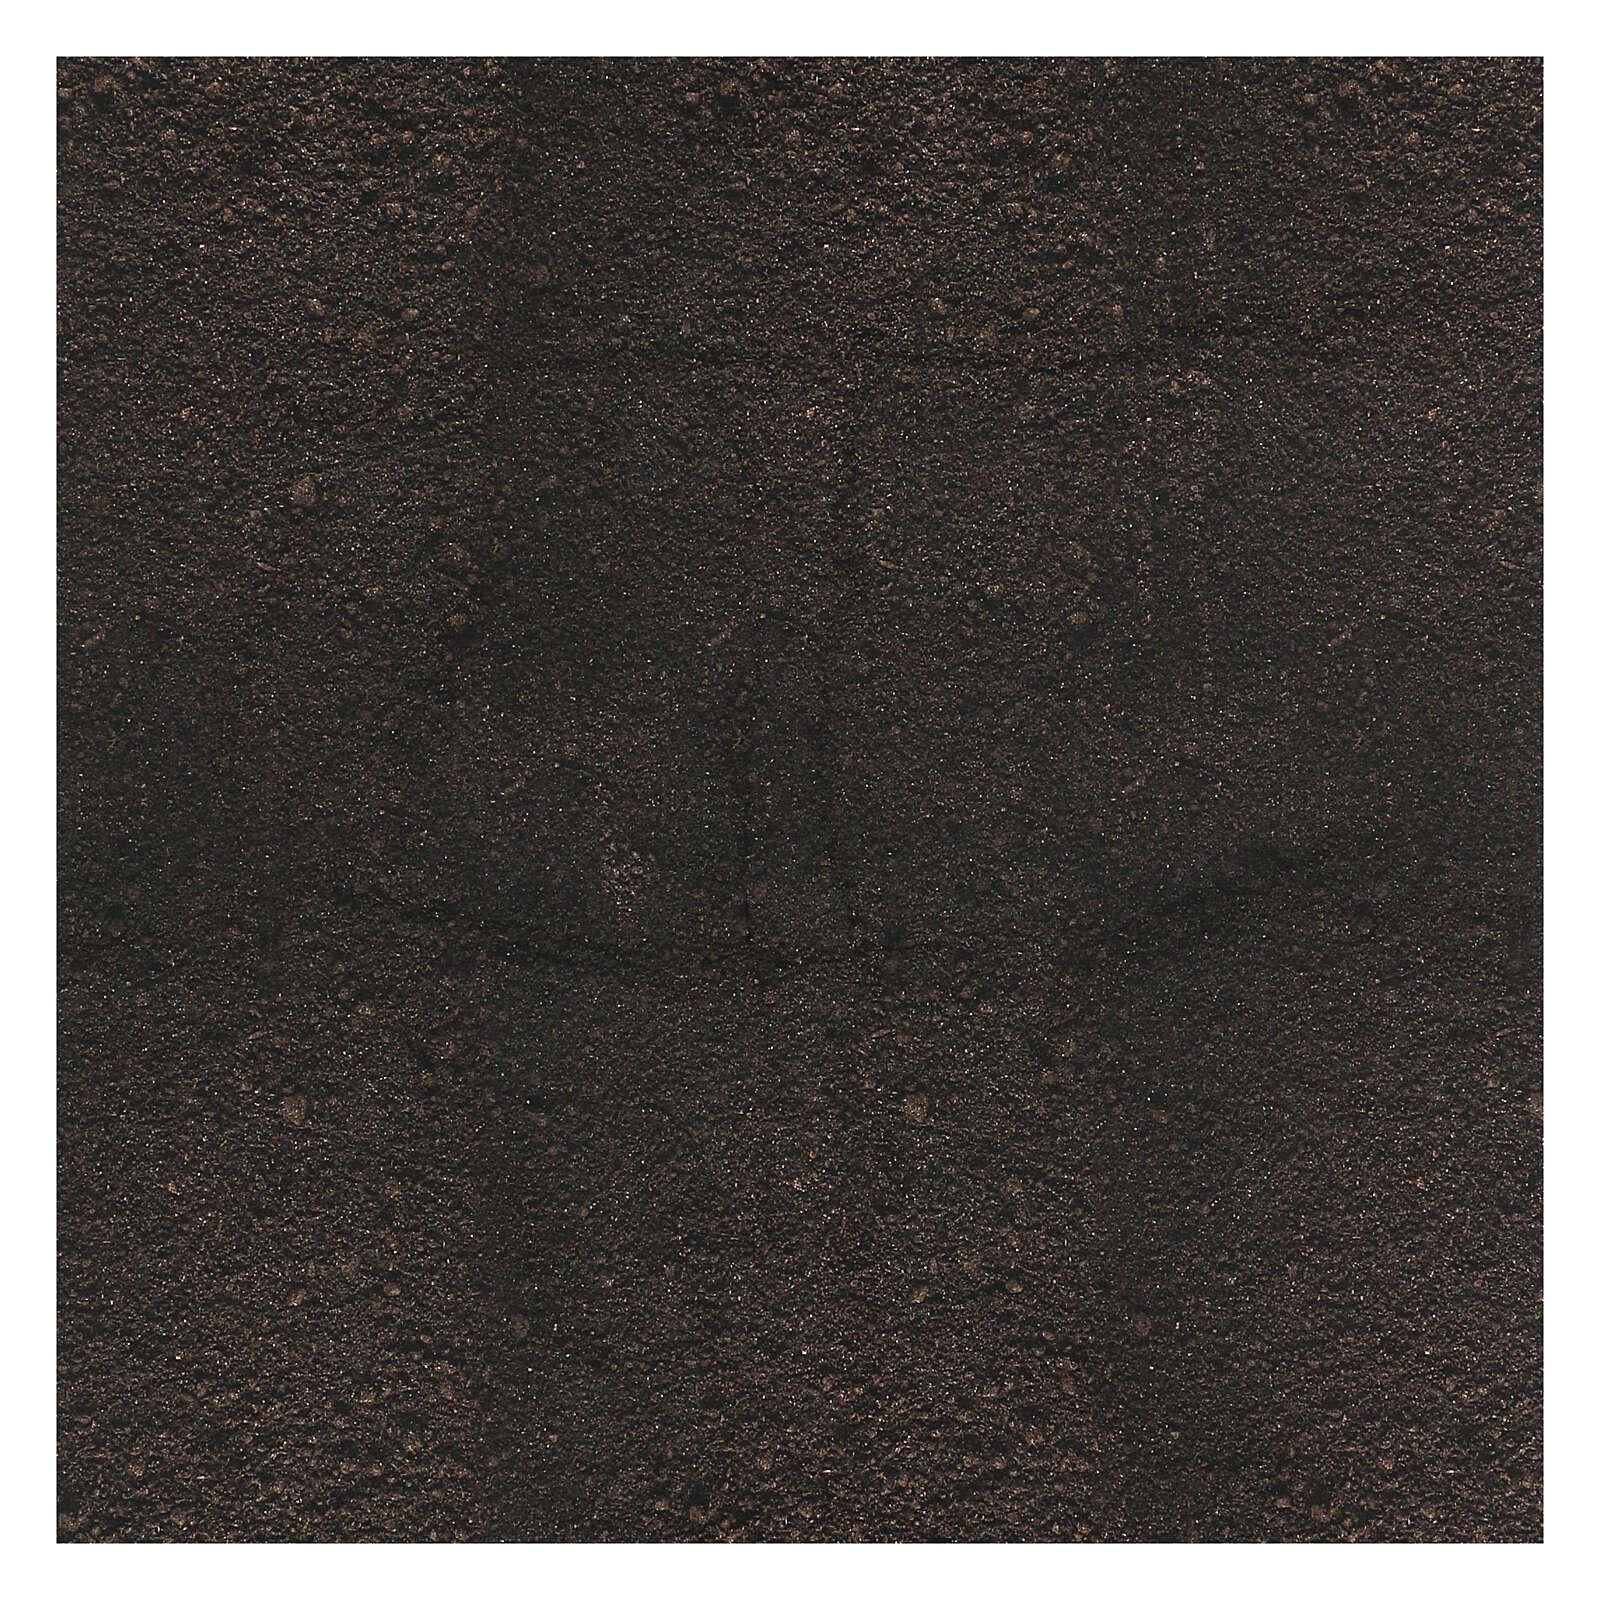 Carta terra scura plasmabile per presepi 4